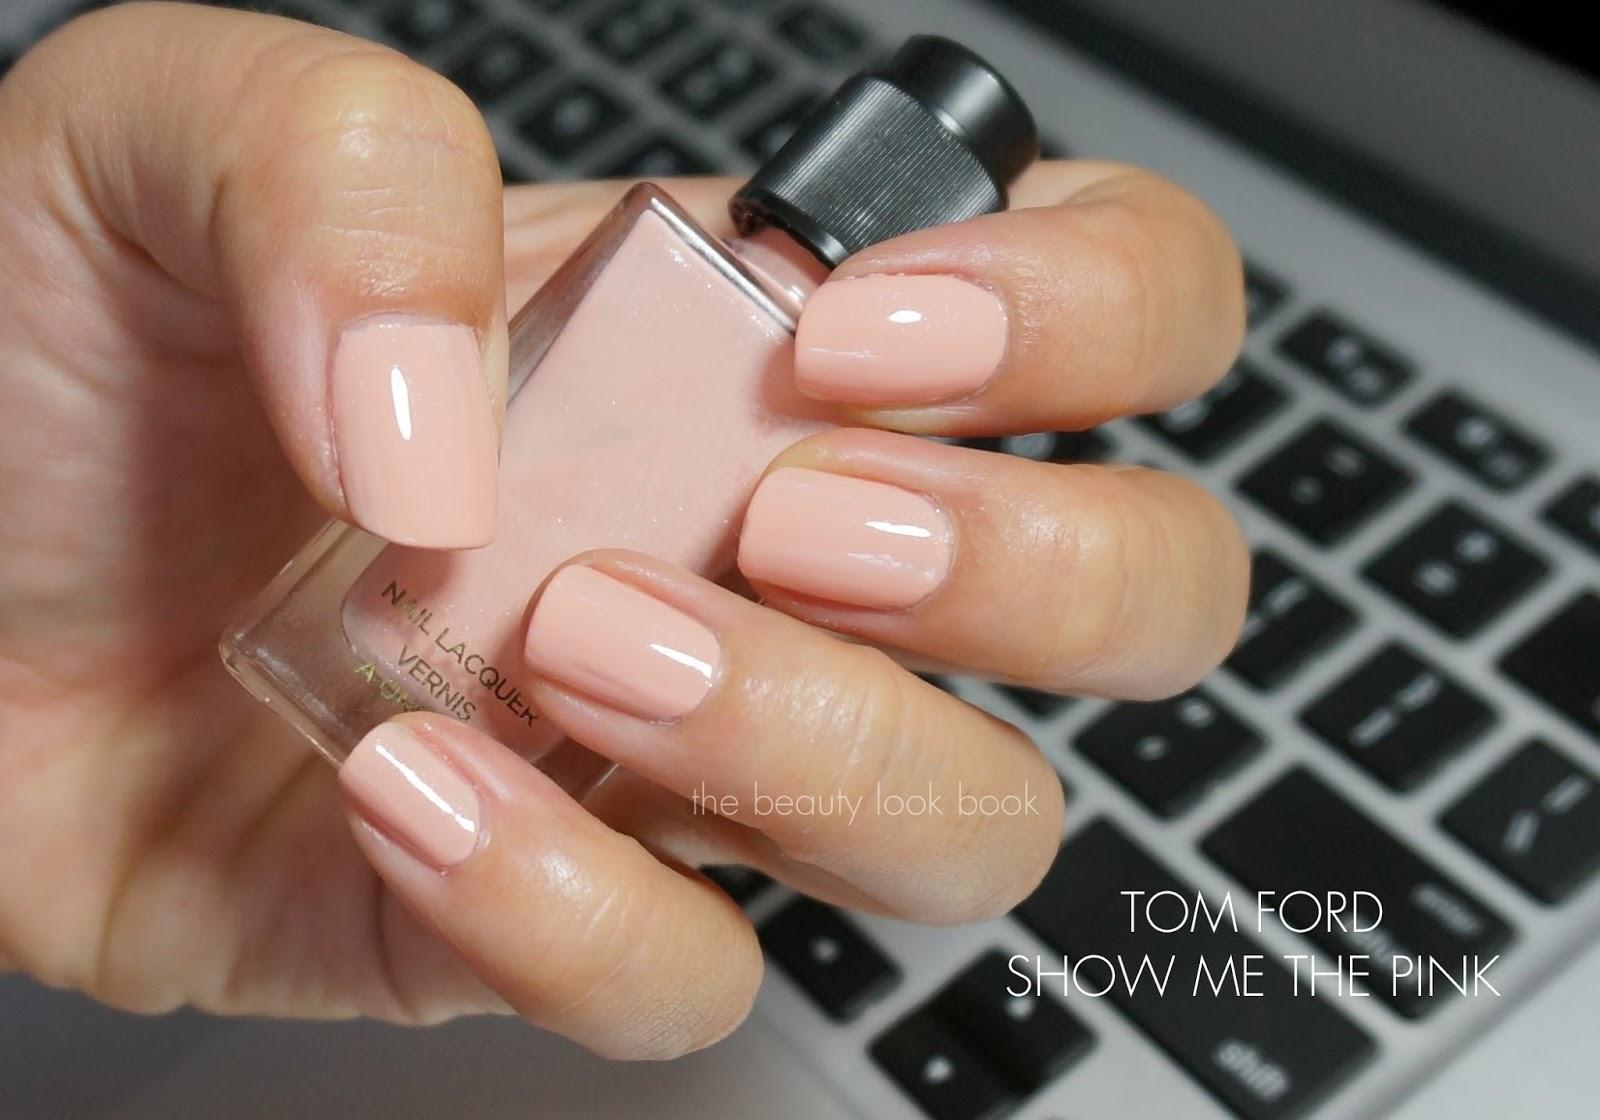 Nude nail polish color - Beauty Insider Community